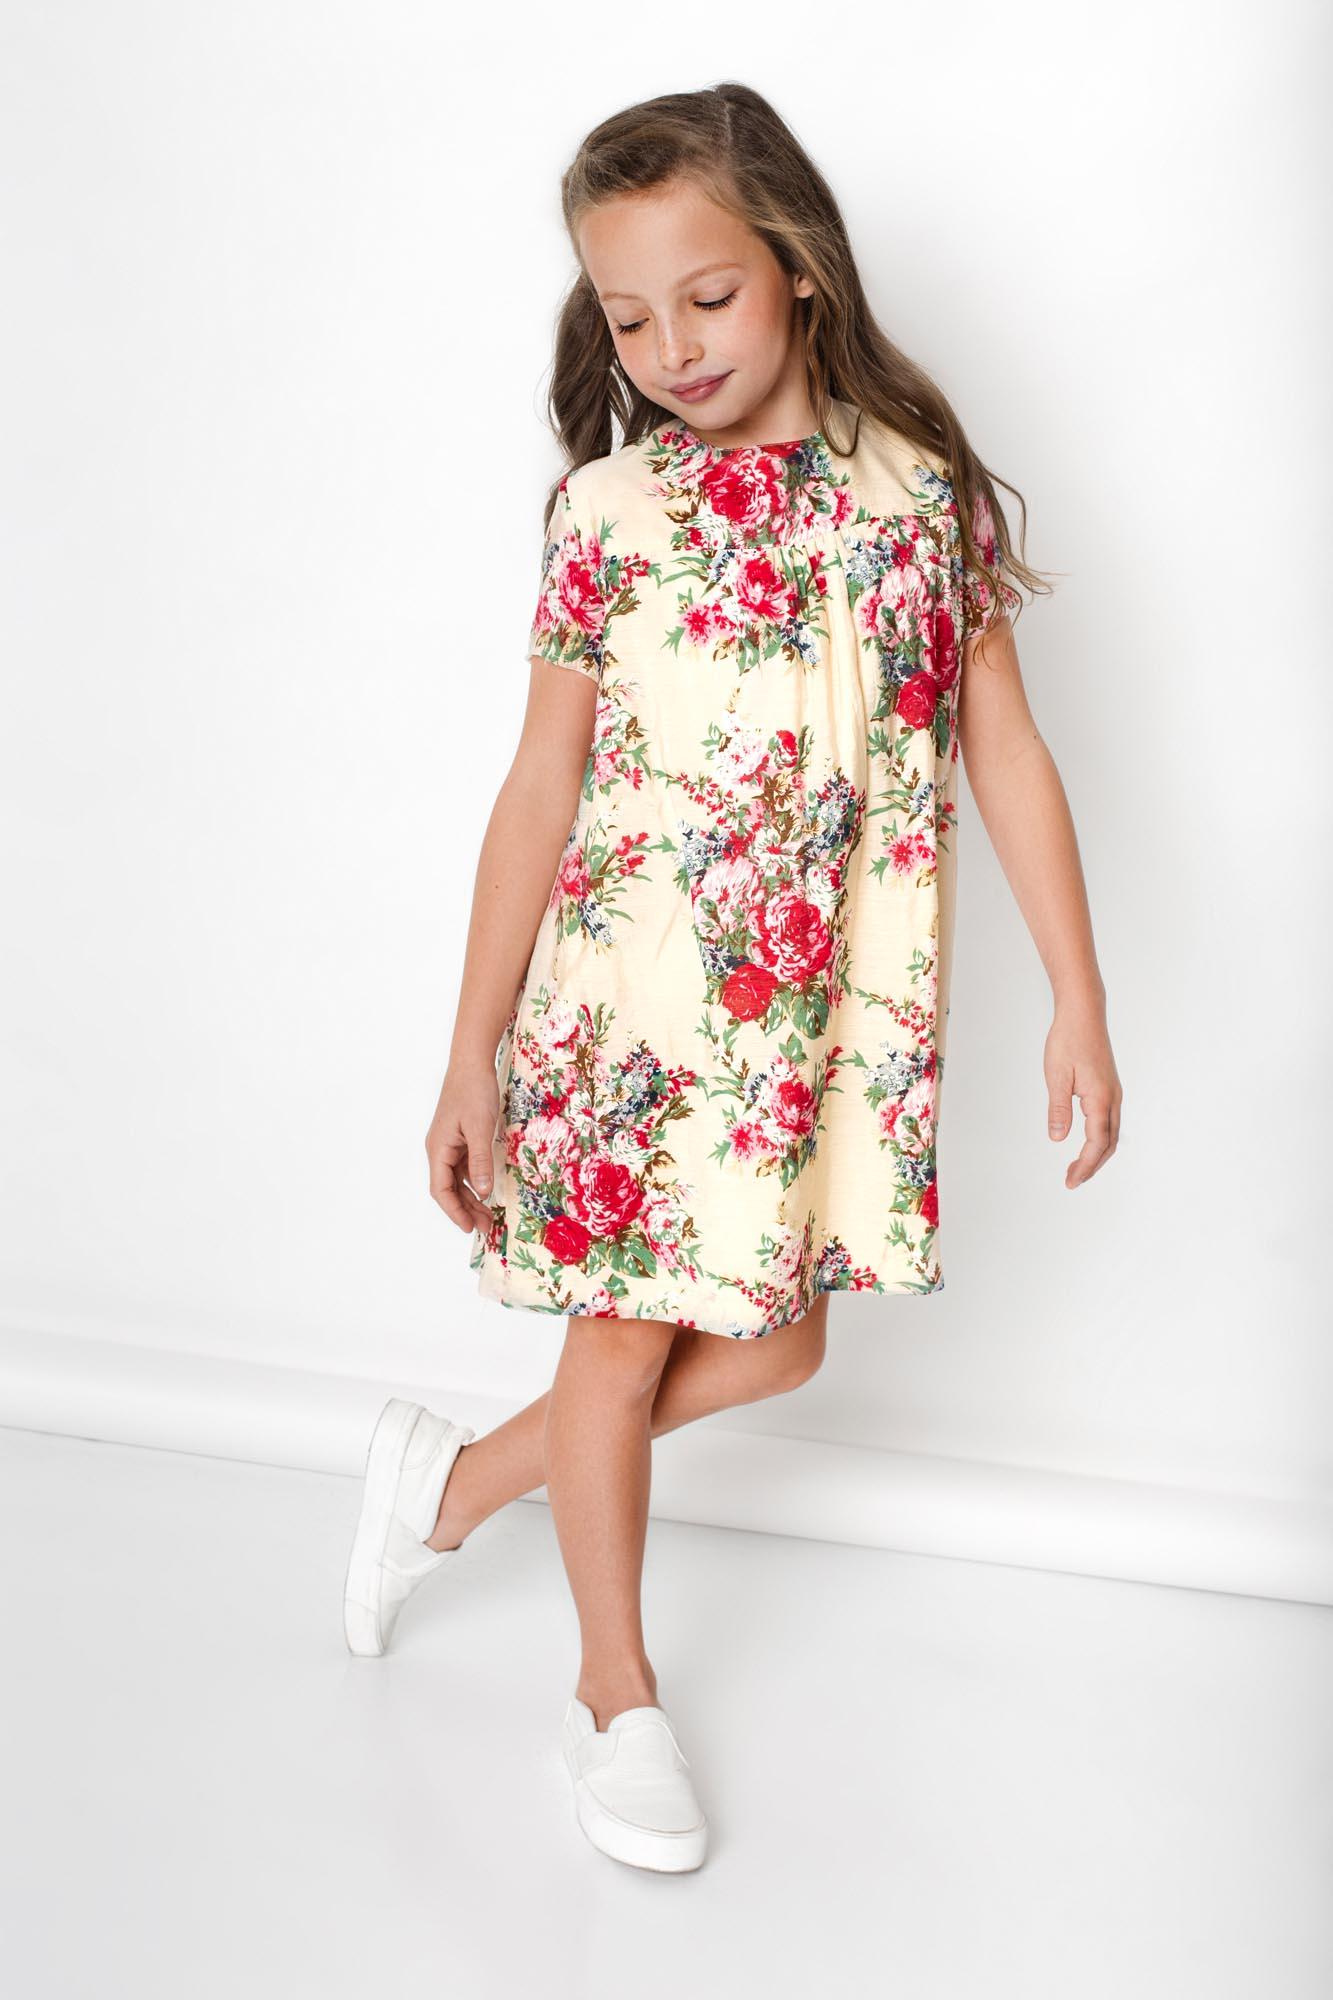 nyc-photographers-kids-modeling-10002.jpg